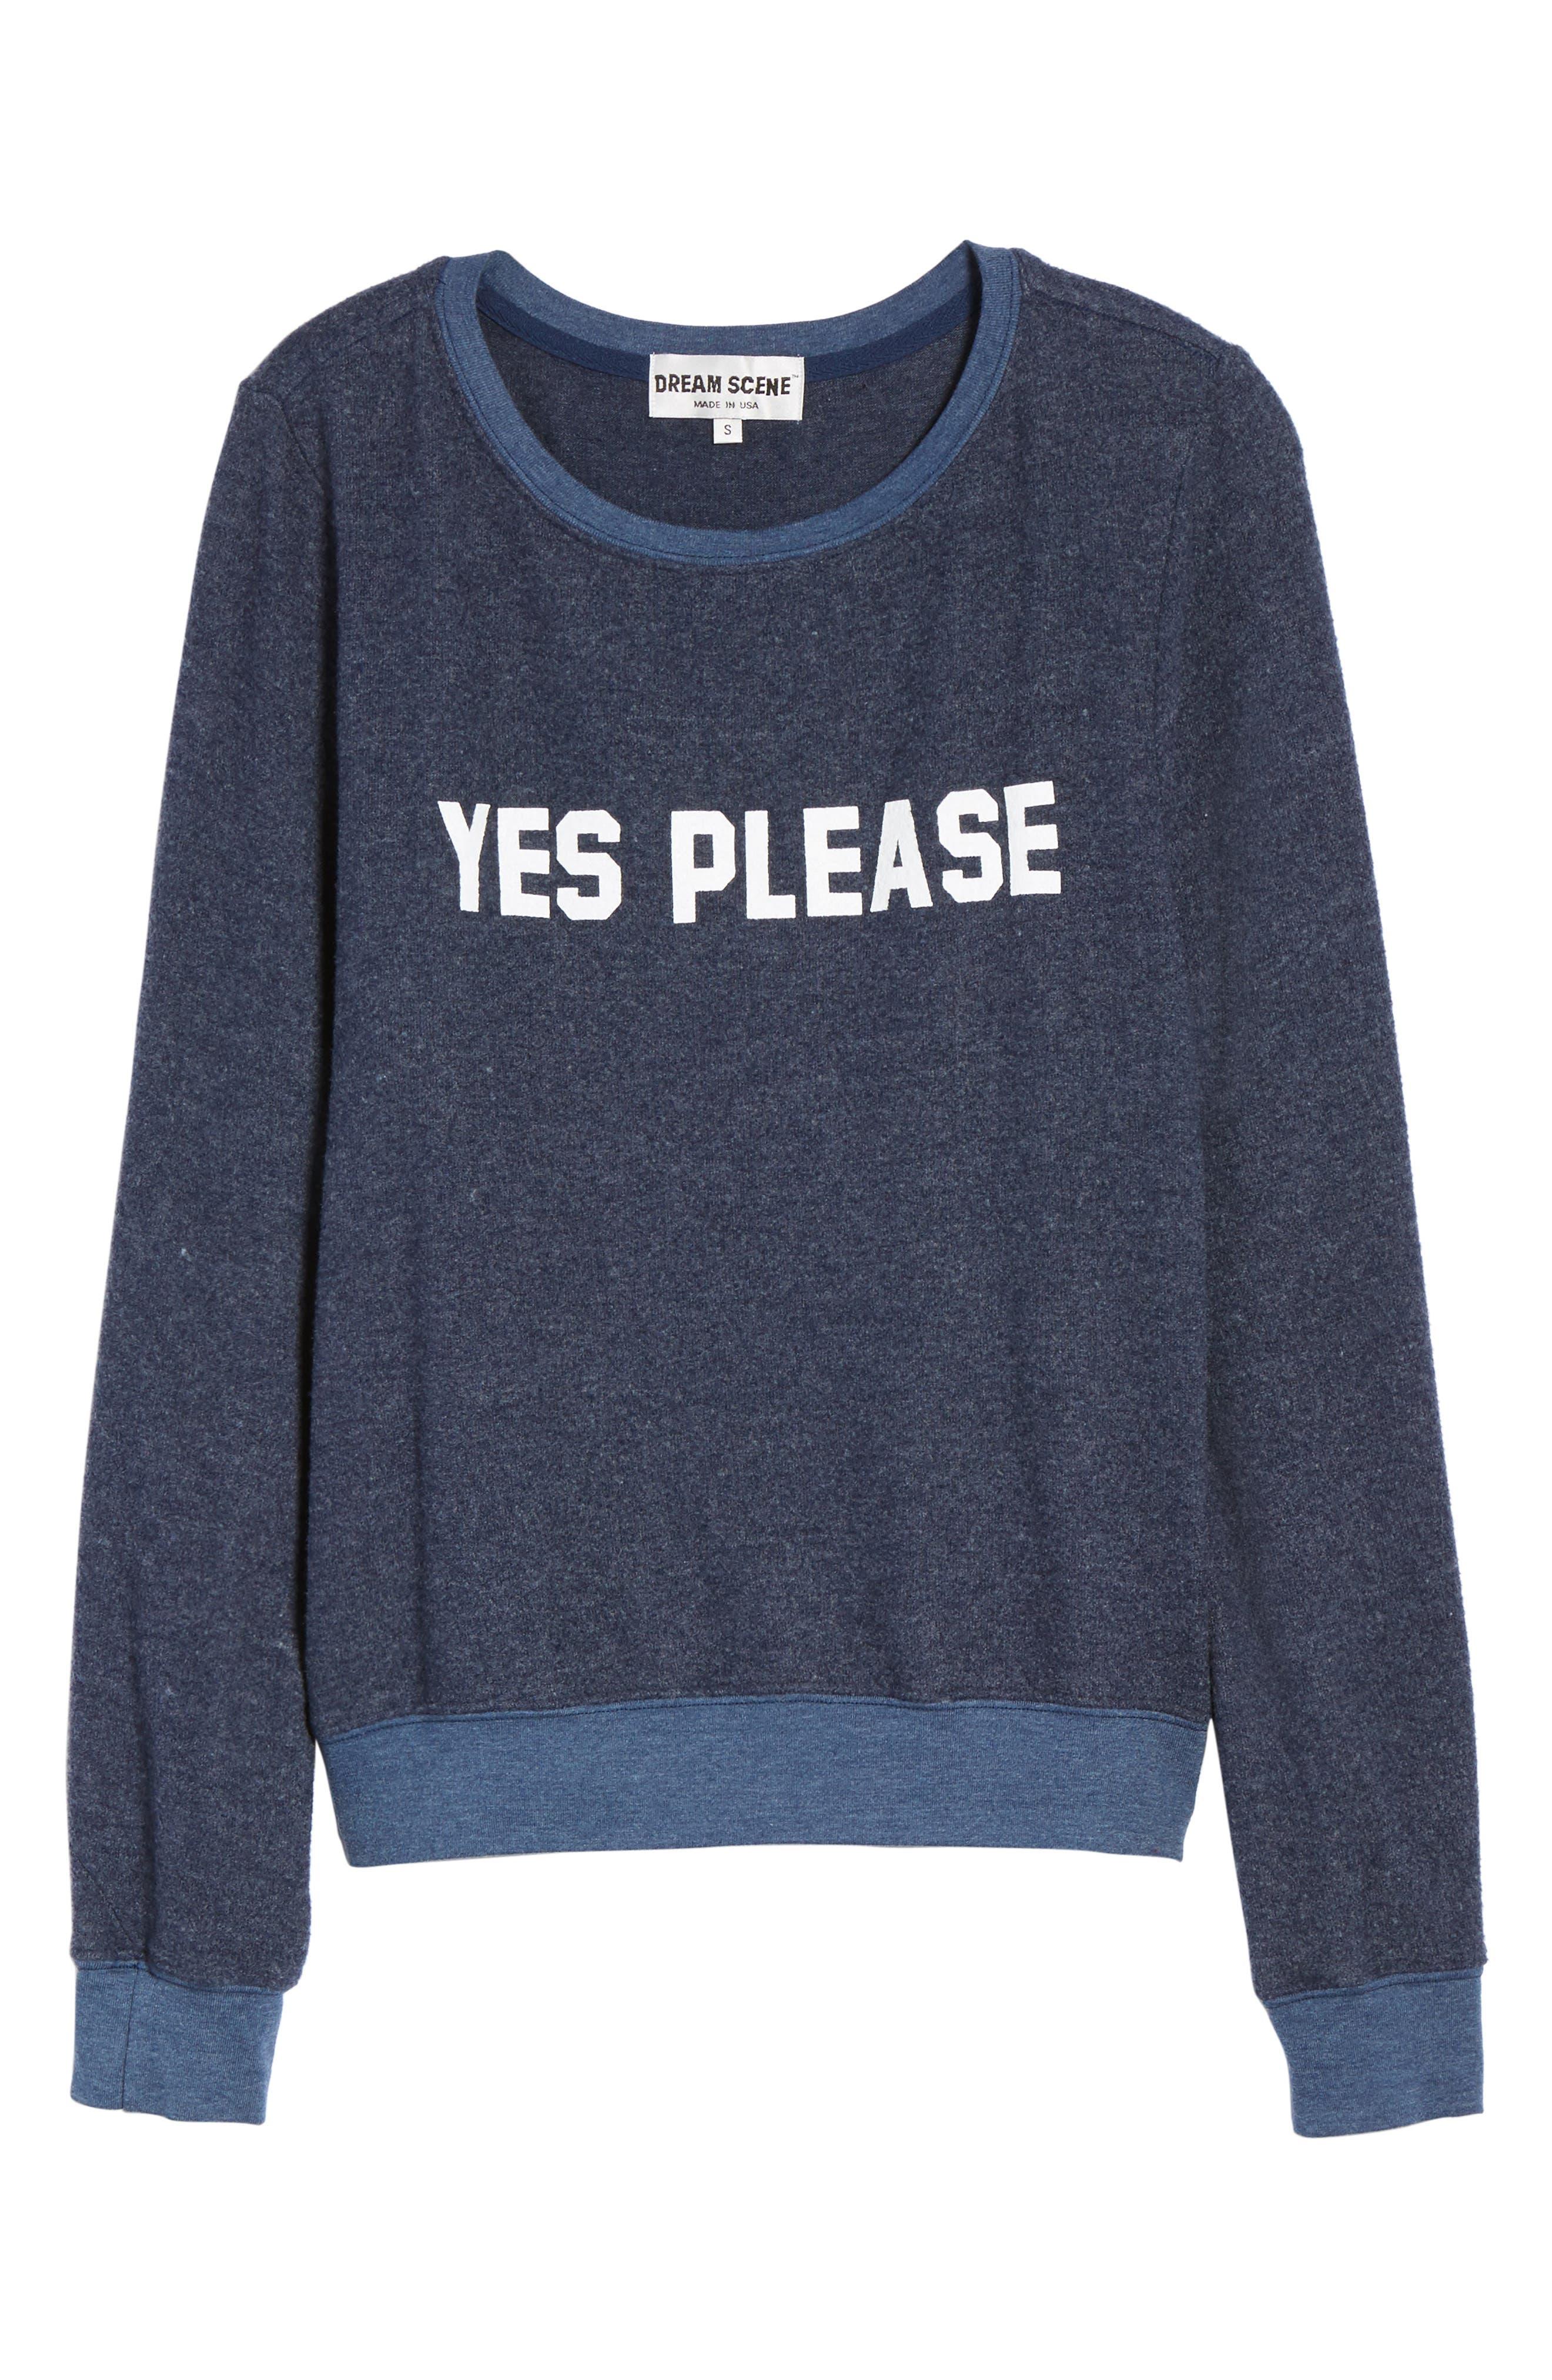 Yes, Please Sweatshirt,                             Alternate thumbnail 6, color,                             401